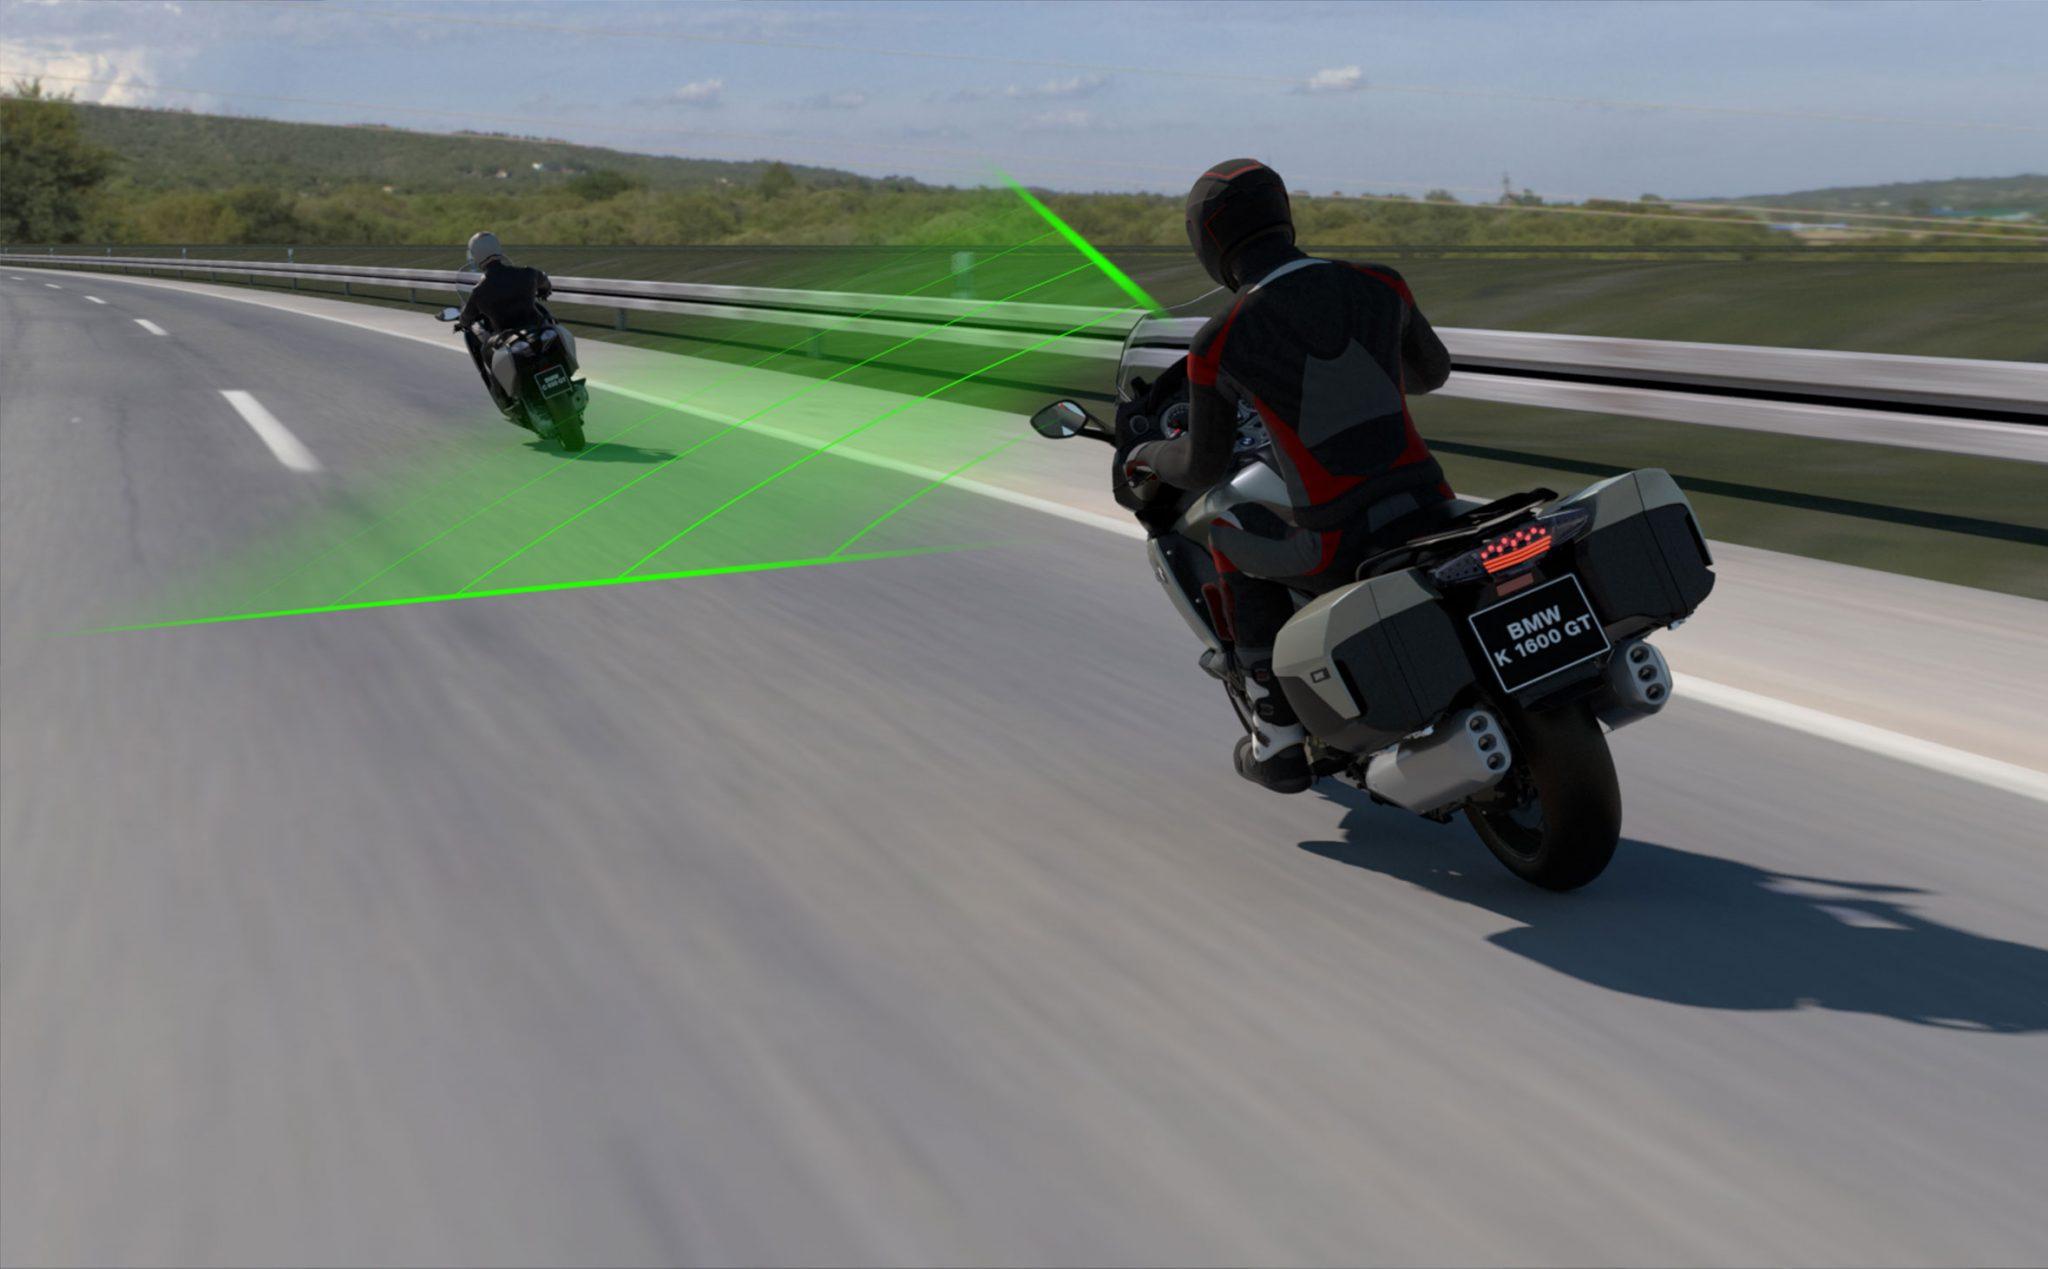 BMW Motorrad ACC - Adaptiver Tempomat / Adaptive Cruise Control